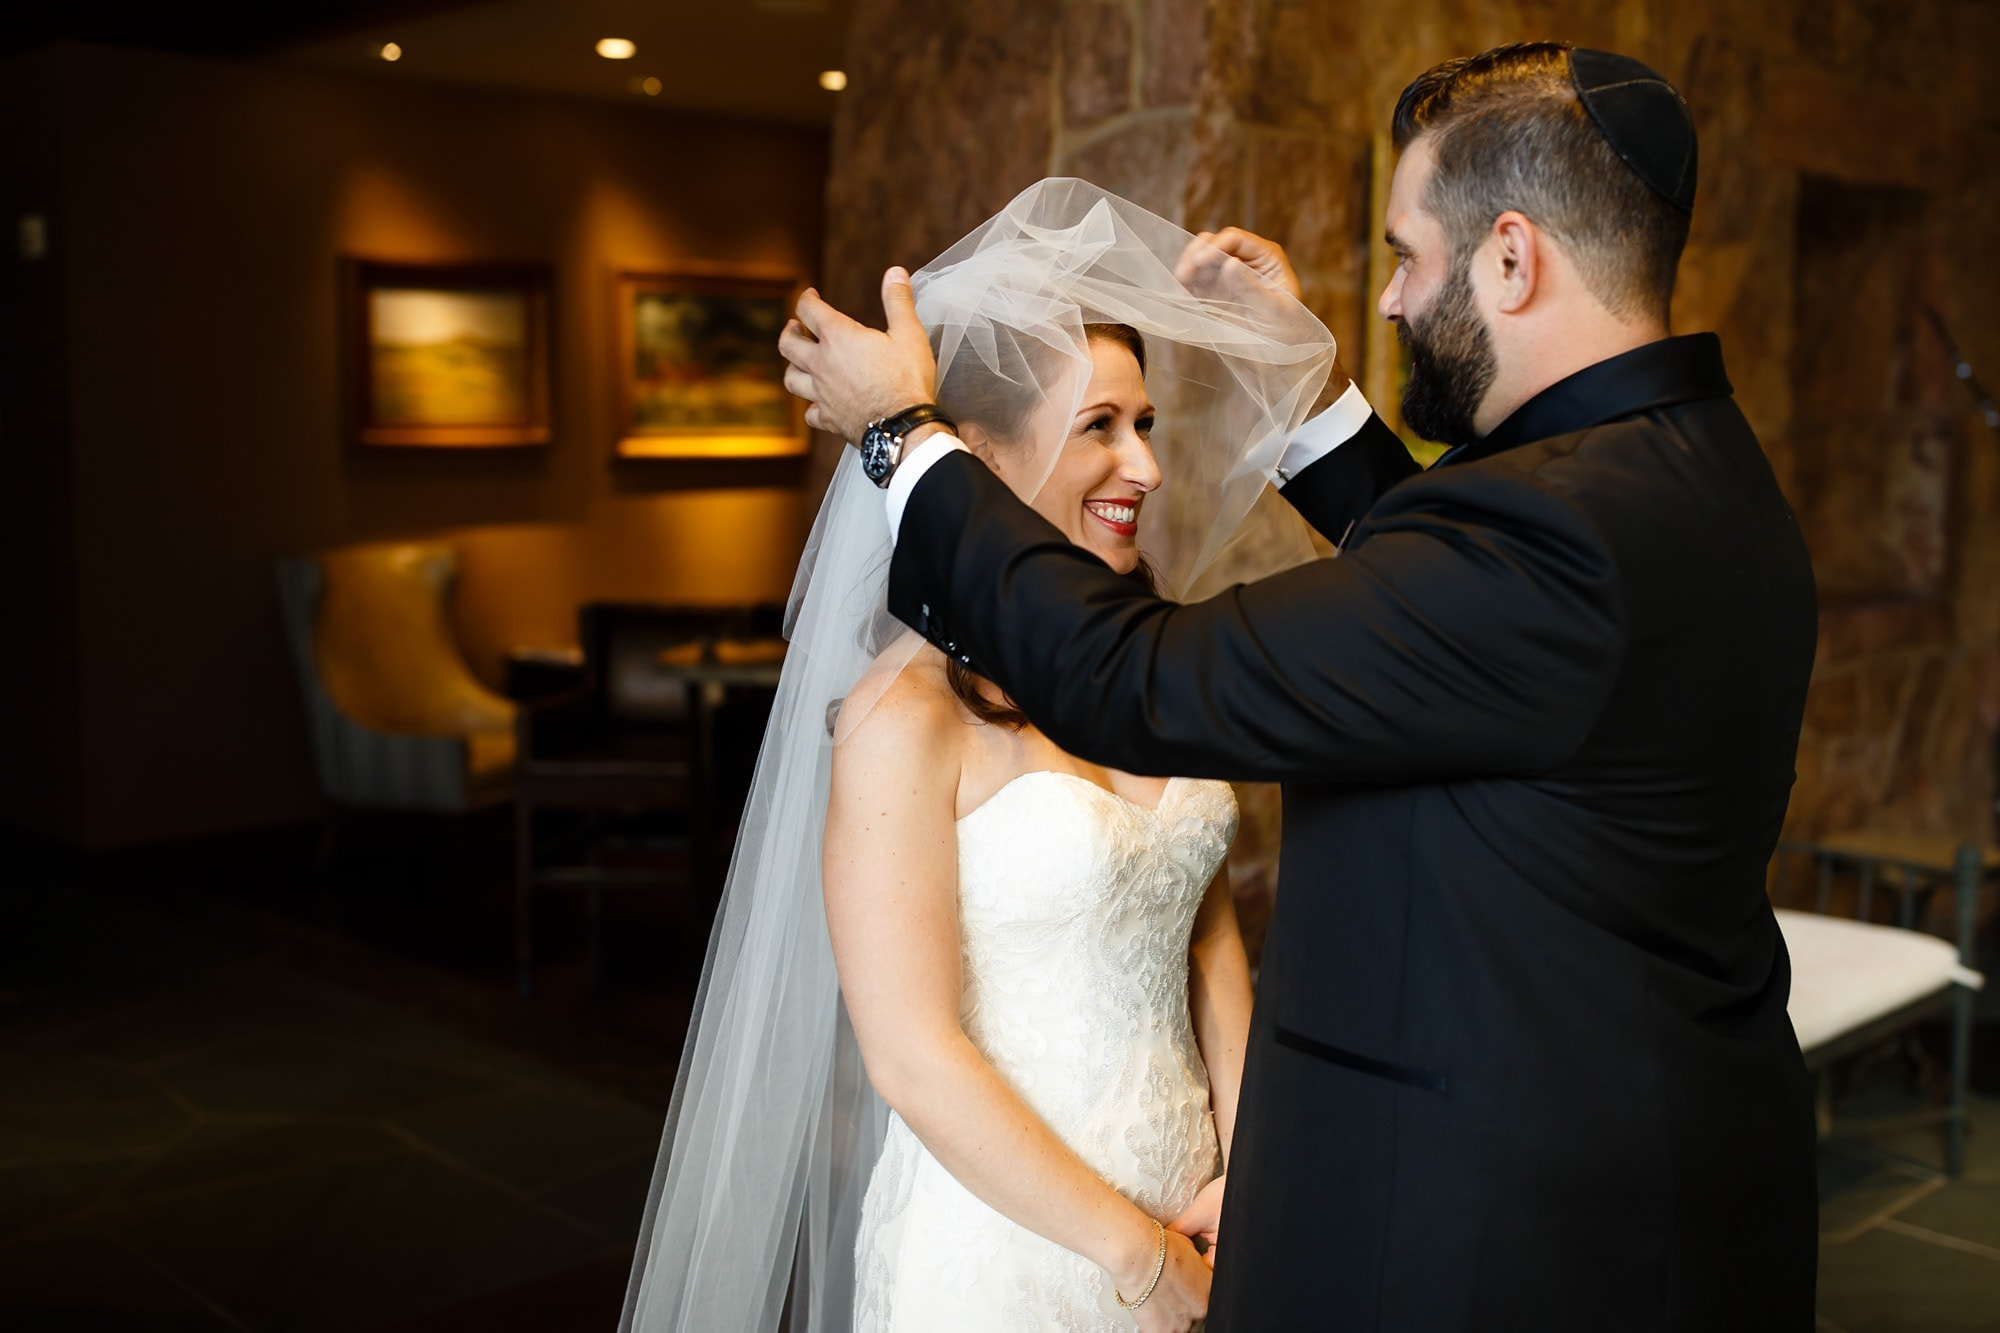 Josh veils his bride before their Jewish wedding ceremony at Garden of the Gods club